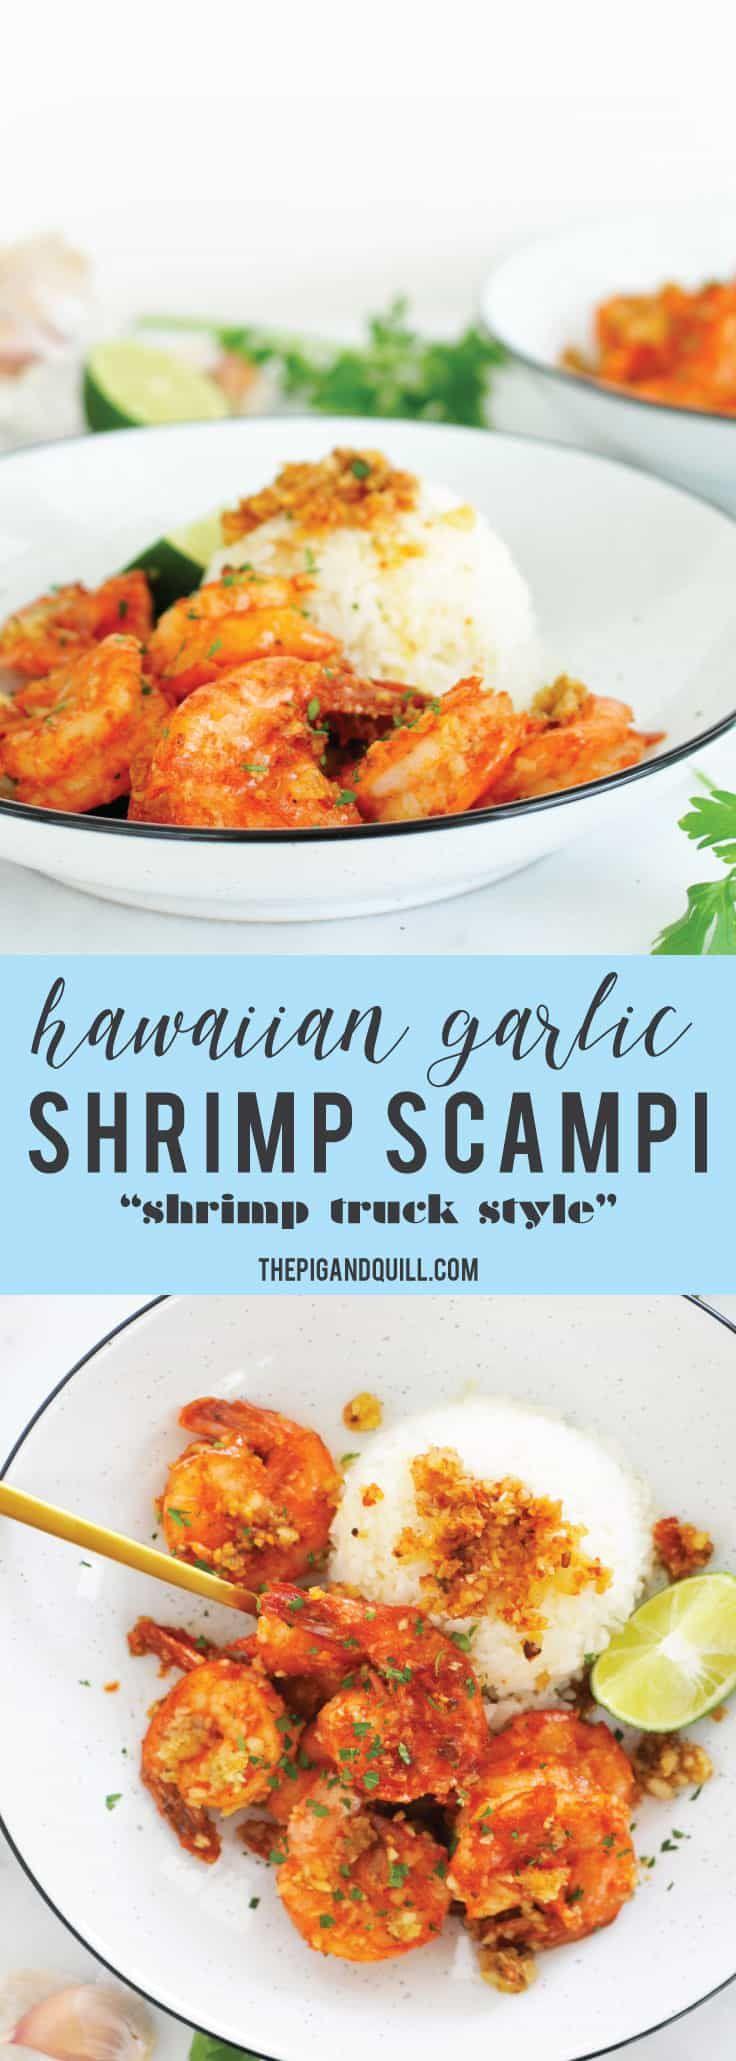 Hawaiian Shrimp Scampi (aka Shrimp Truck Garlic Shrimp) #garlicshrimprecipes